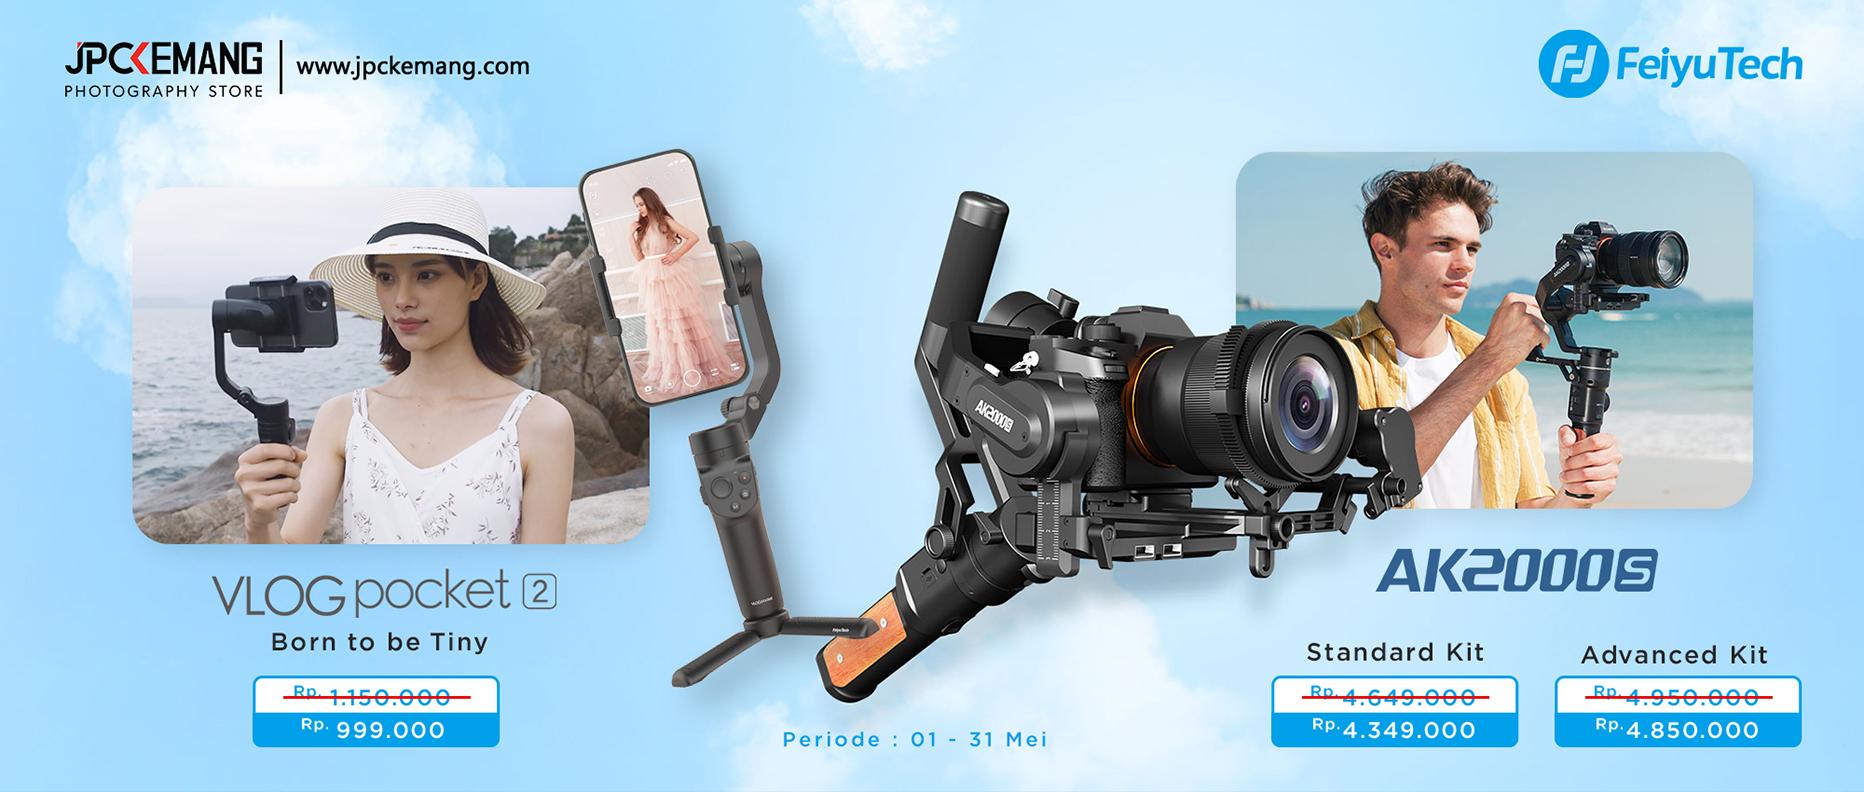 Feiyu Vlog Pocket 2 dan AK2000S